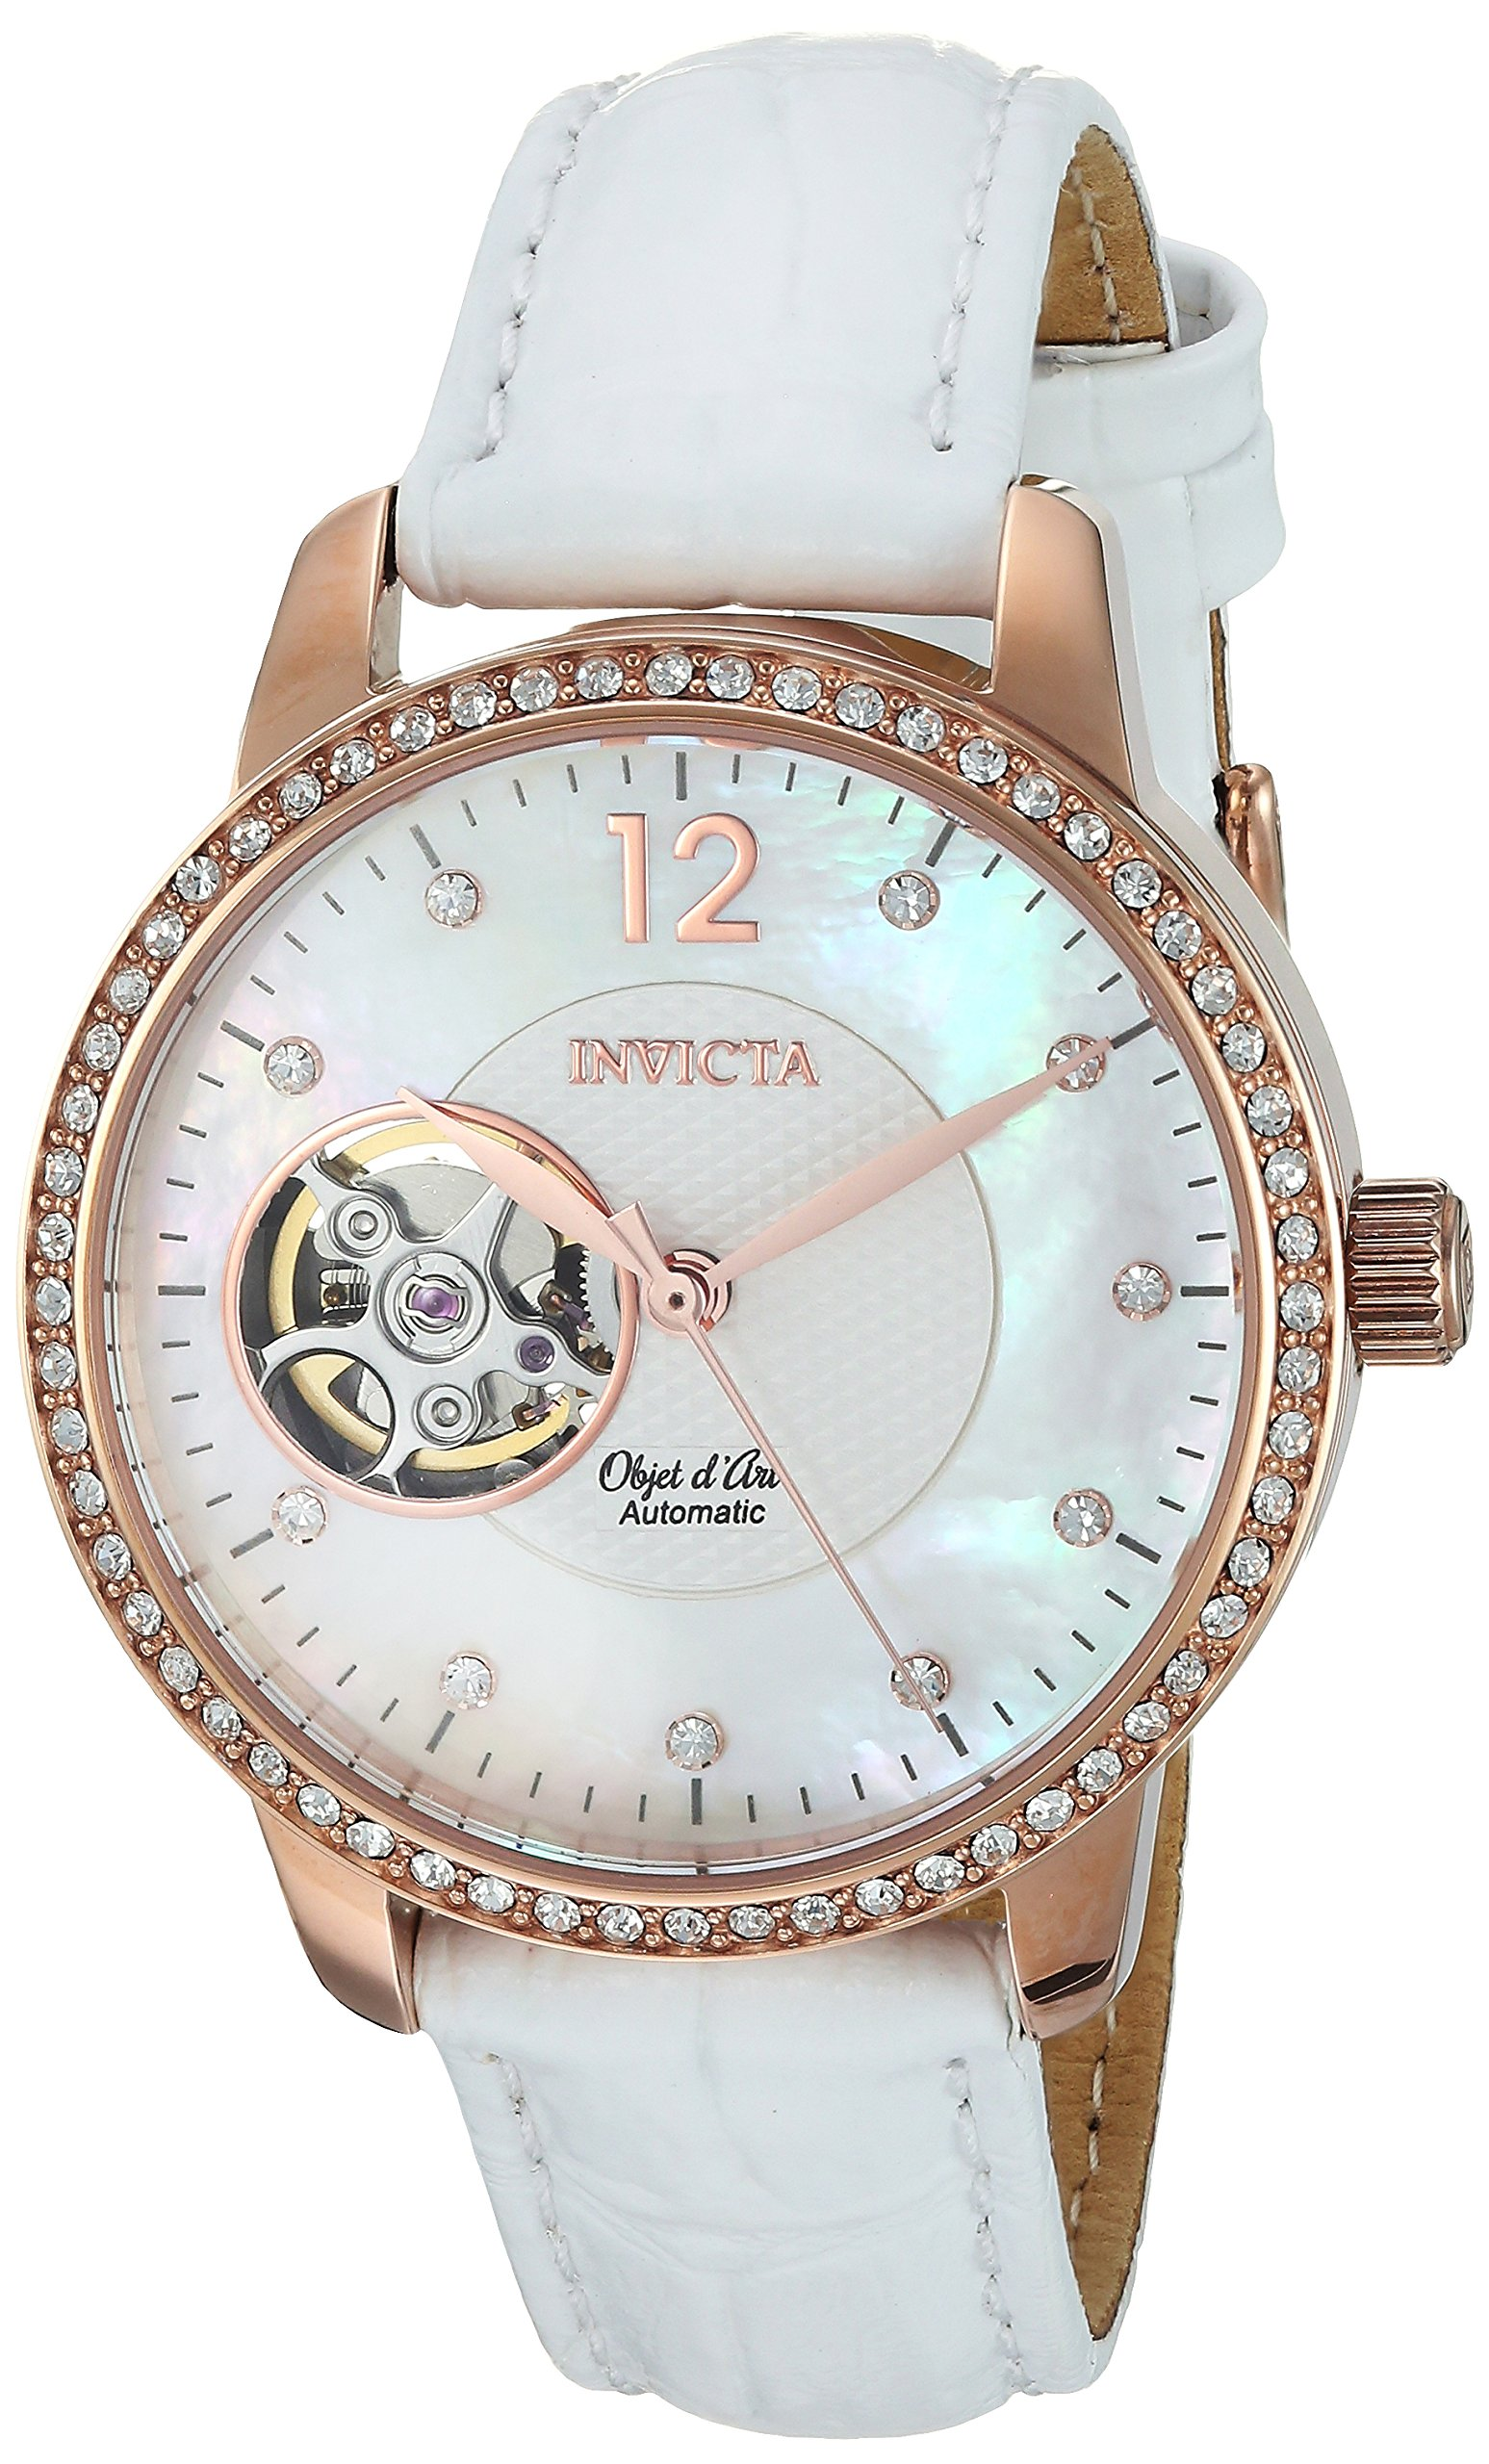 ویکالا · خرید  اصل اورجینال · خرید از آمازون · Invicta Women's Objet D Art Gold Automatic-self-Wind Watch with Leather Calfskin Strap, White, 15 (Model: 22622) wekala · ویکالا